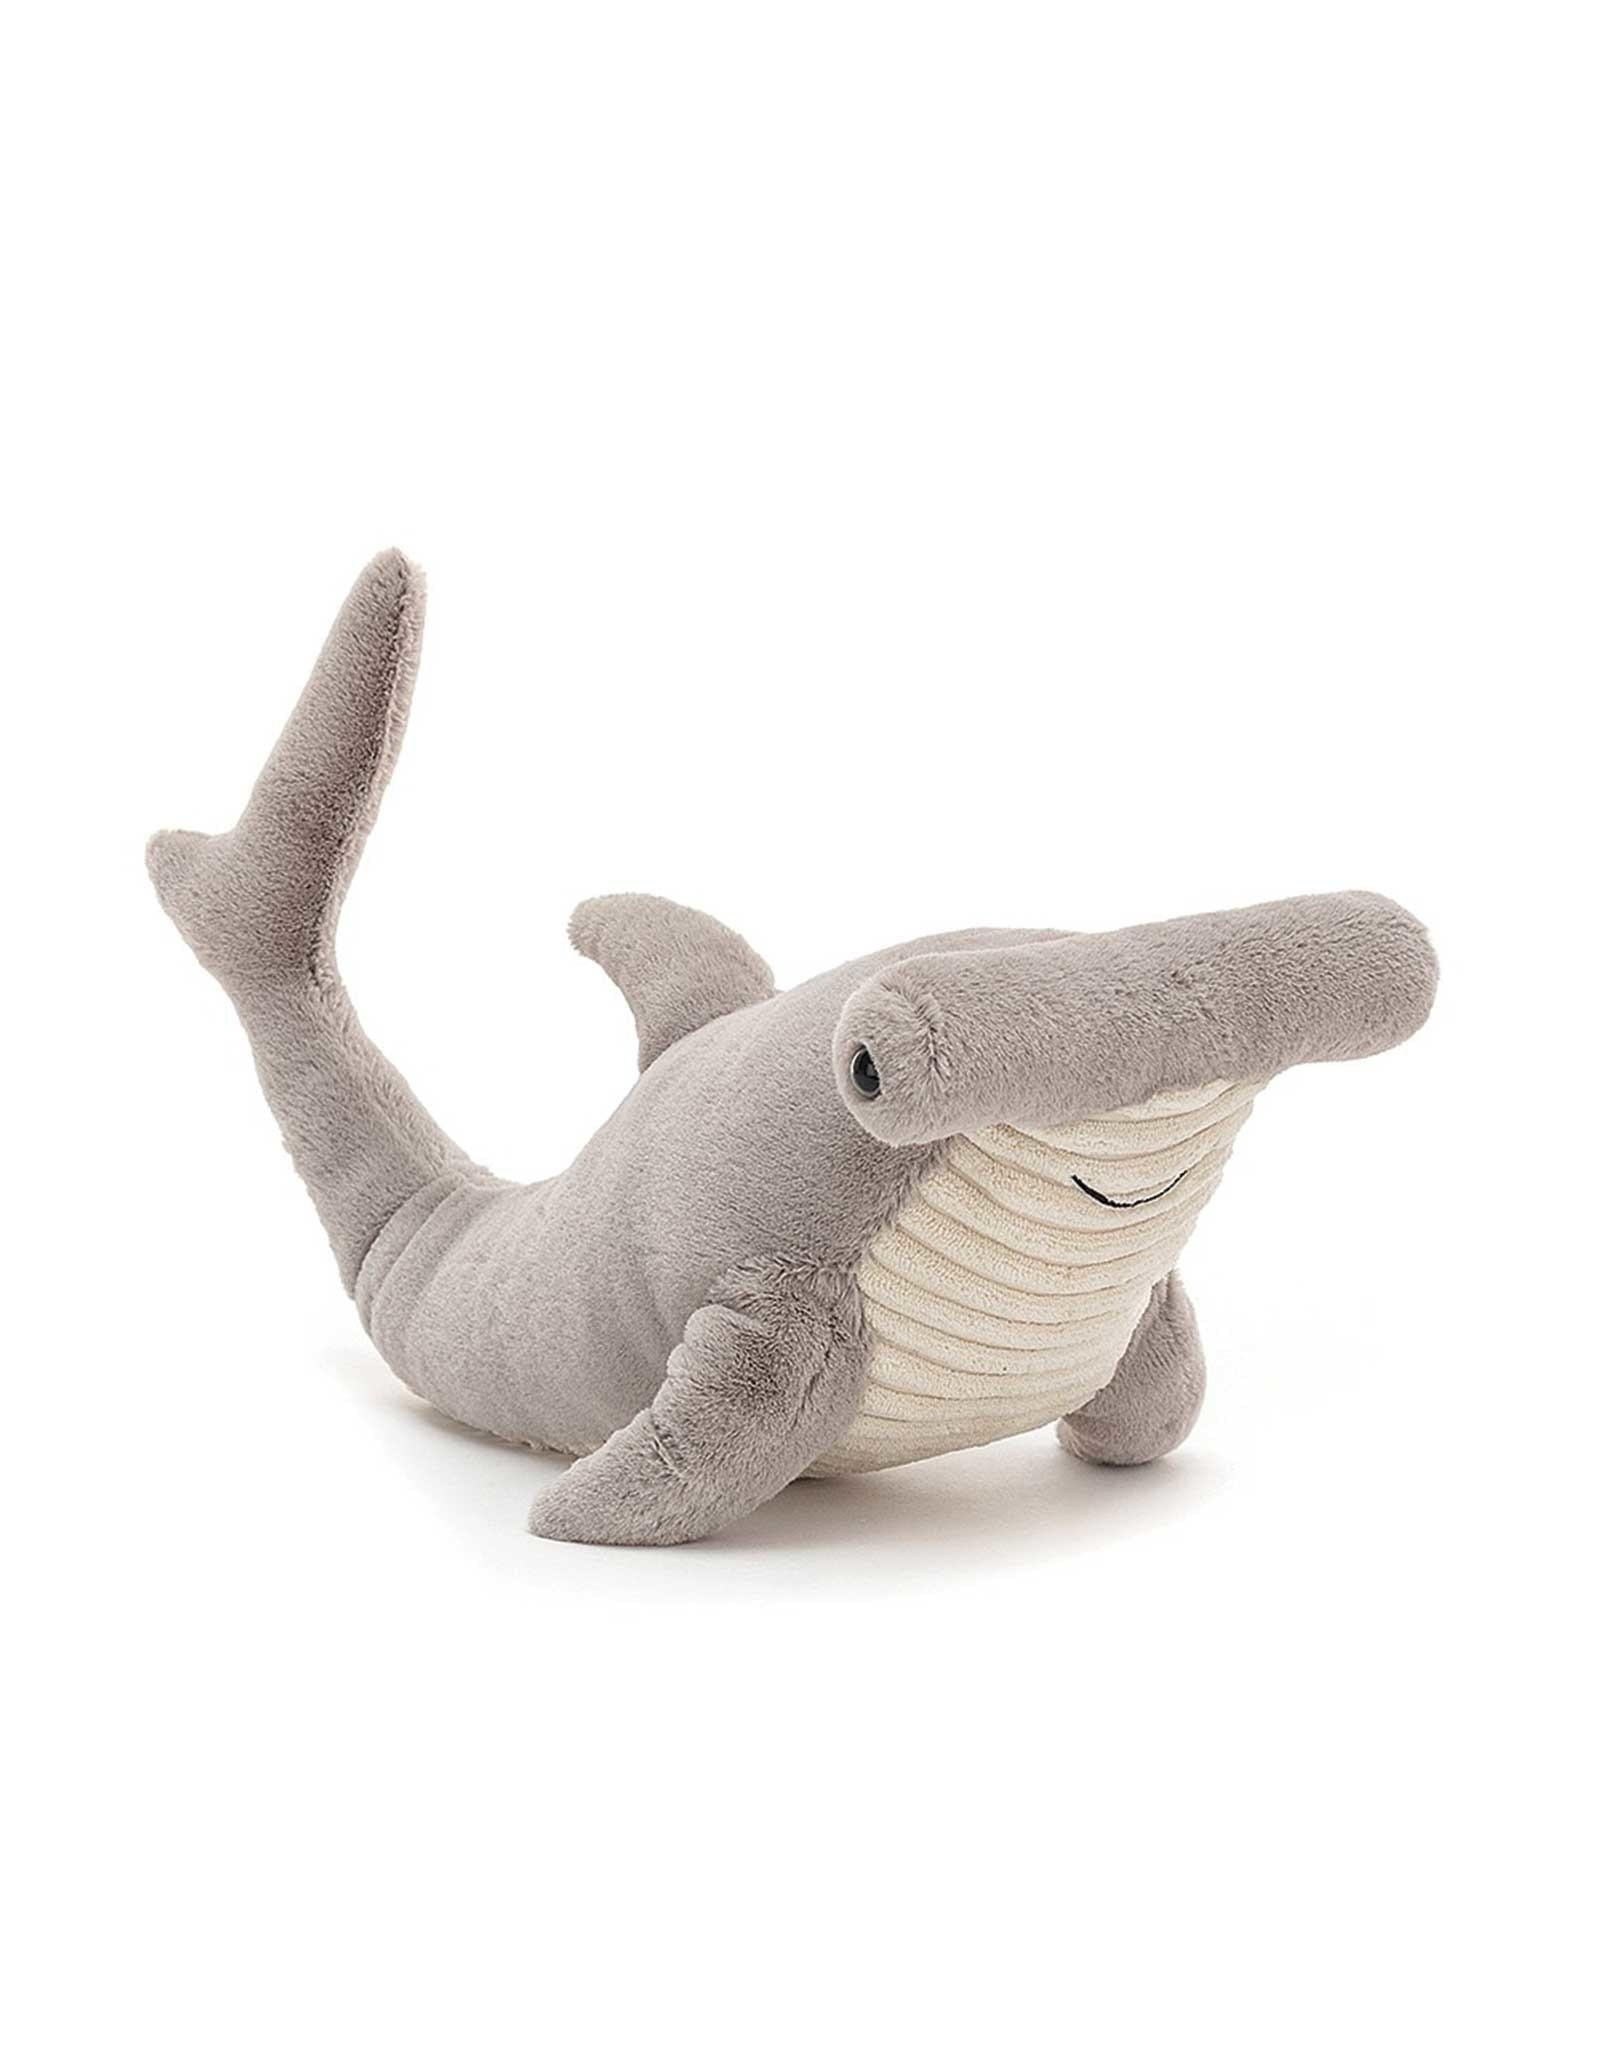 Jelly Cat Plush - Harley Hammerhead Shark